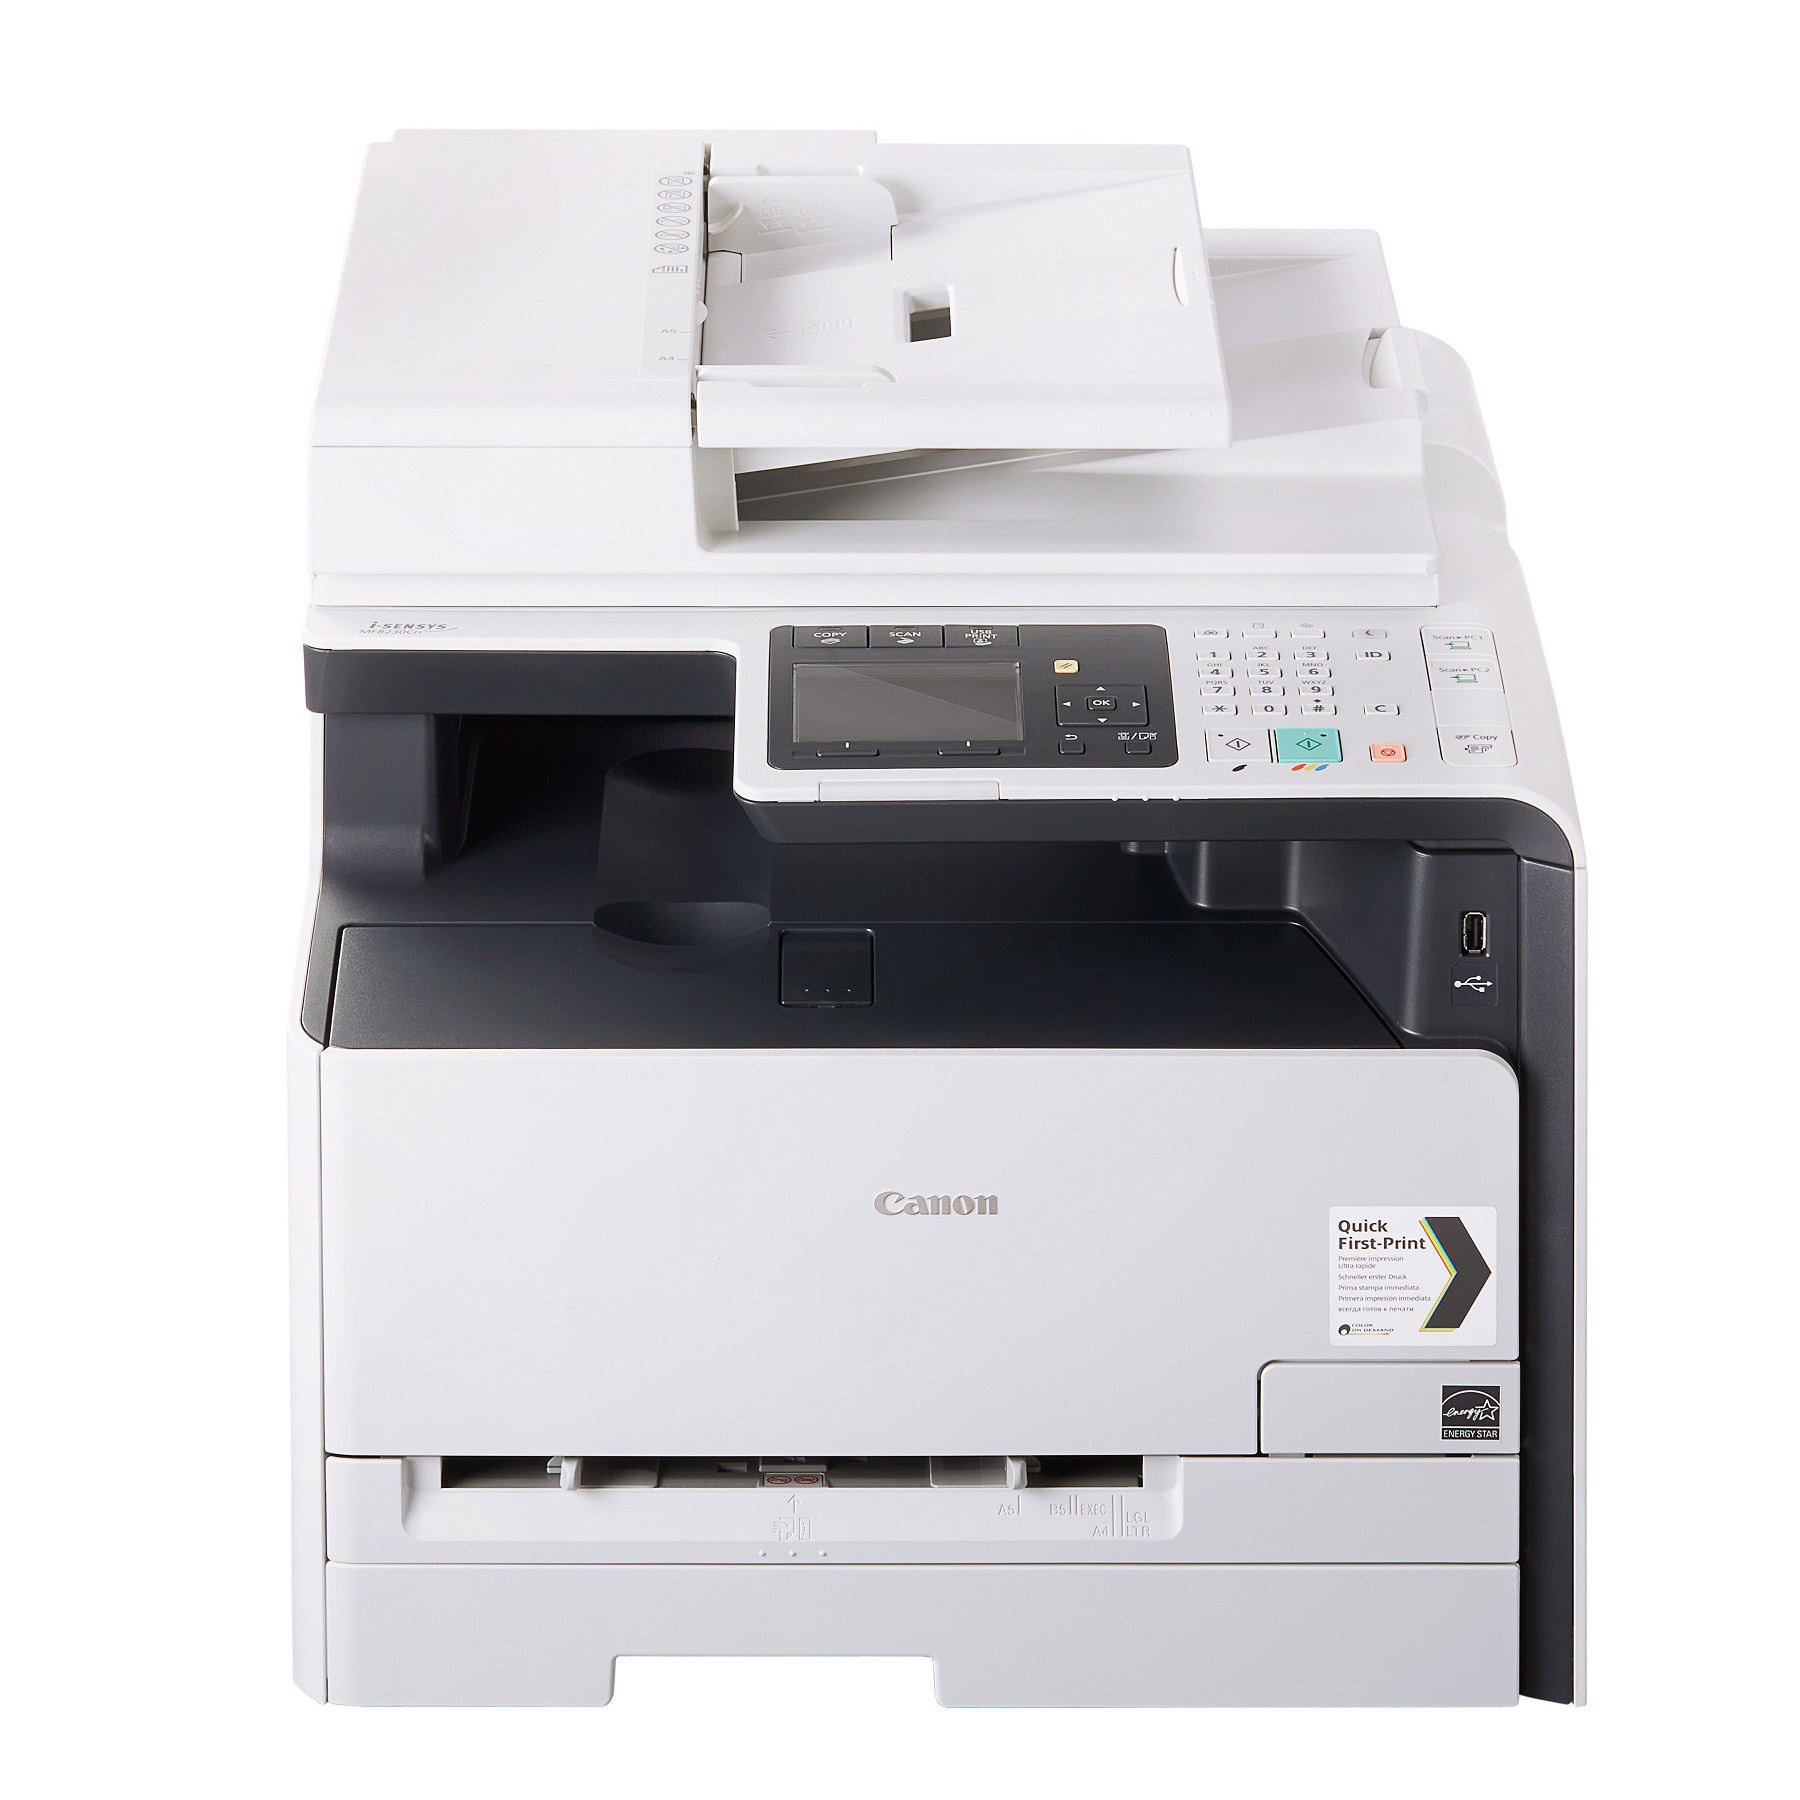 Принтер Canon i-SENSYS MF8230Cn